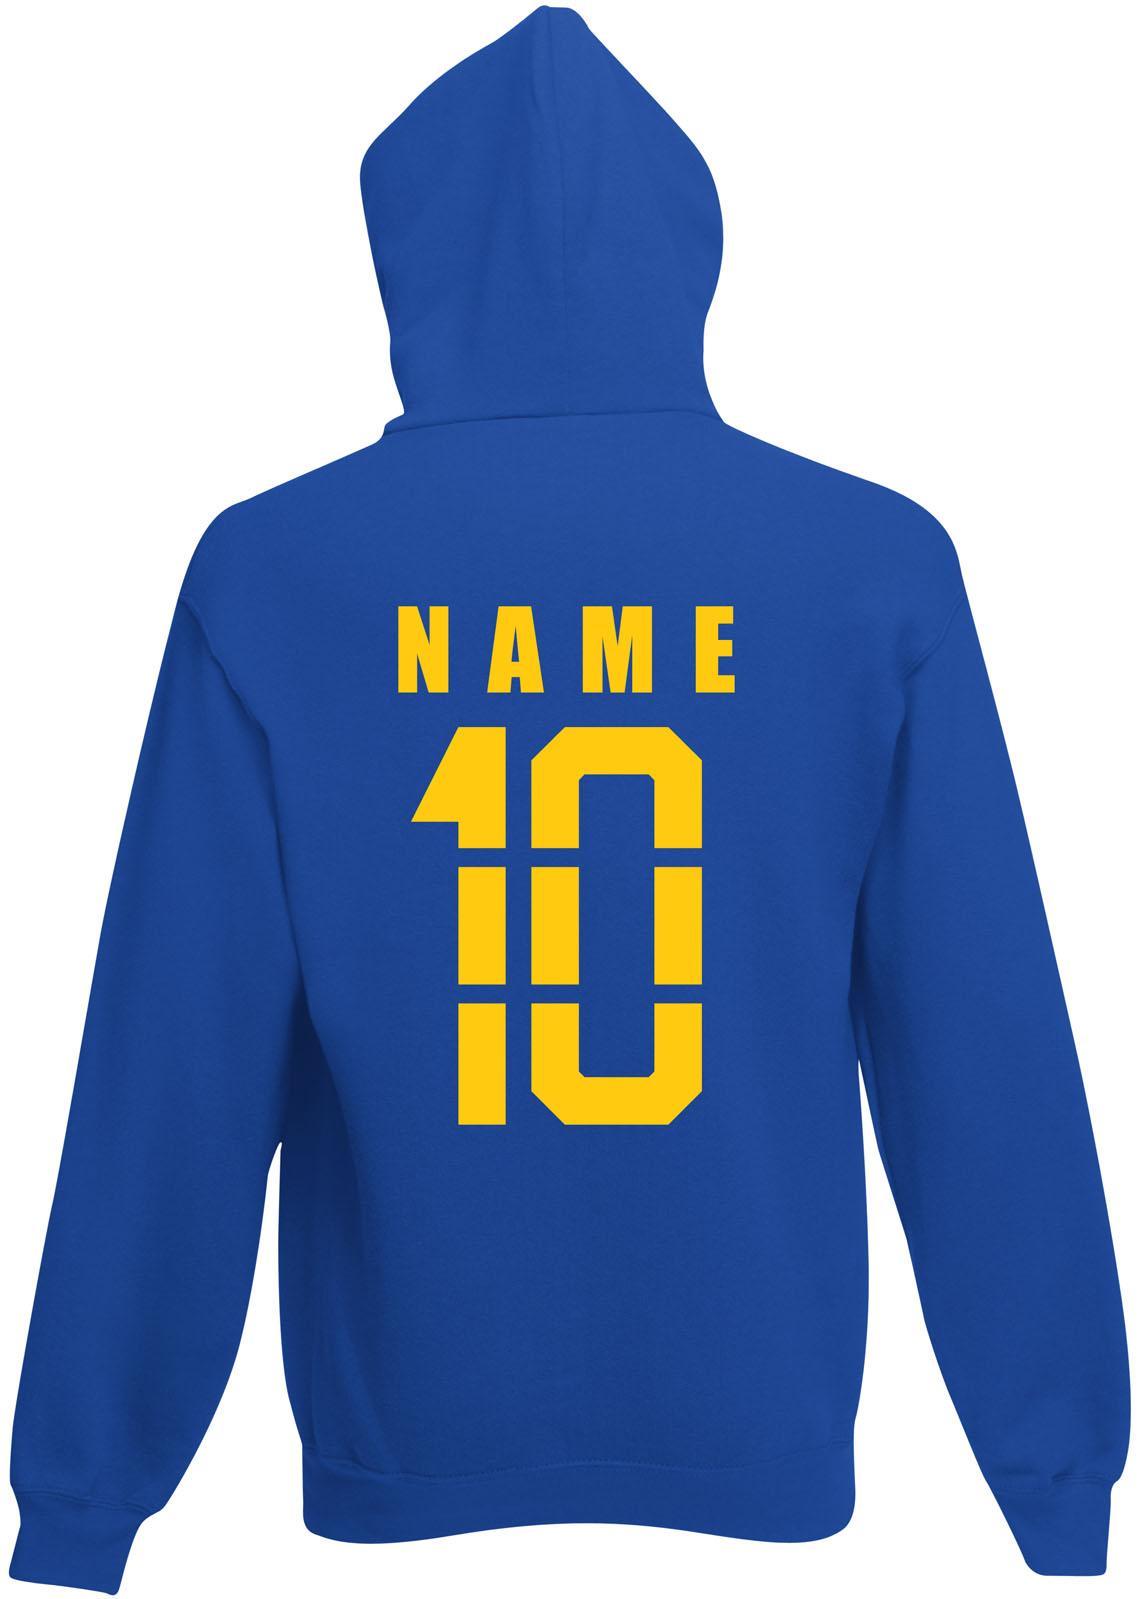 Schweden Sverige Hoody Kapuzen Pullover Trikot mit Name /& Nummer S M L XL XXL